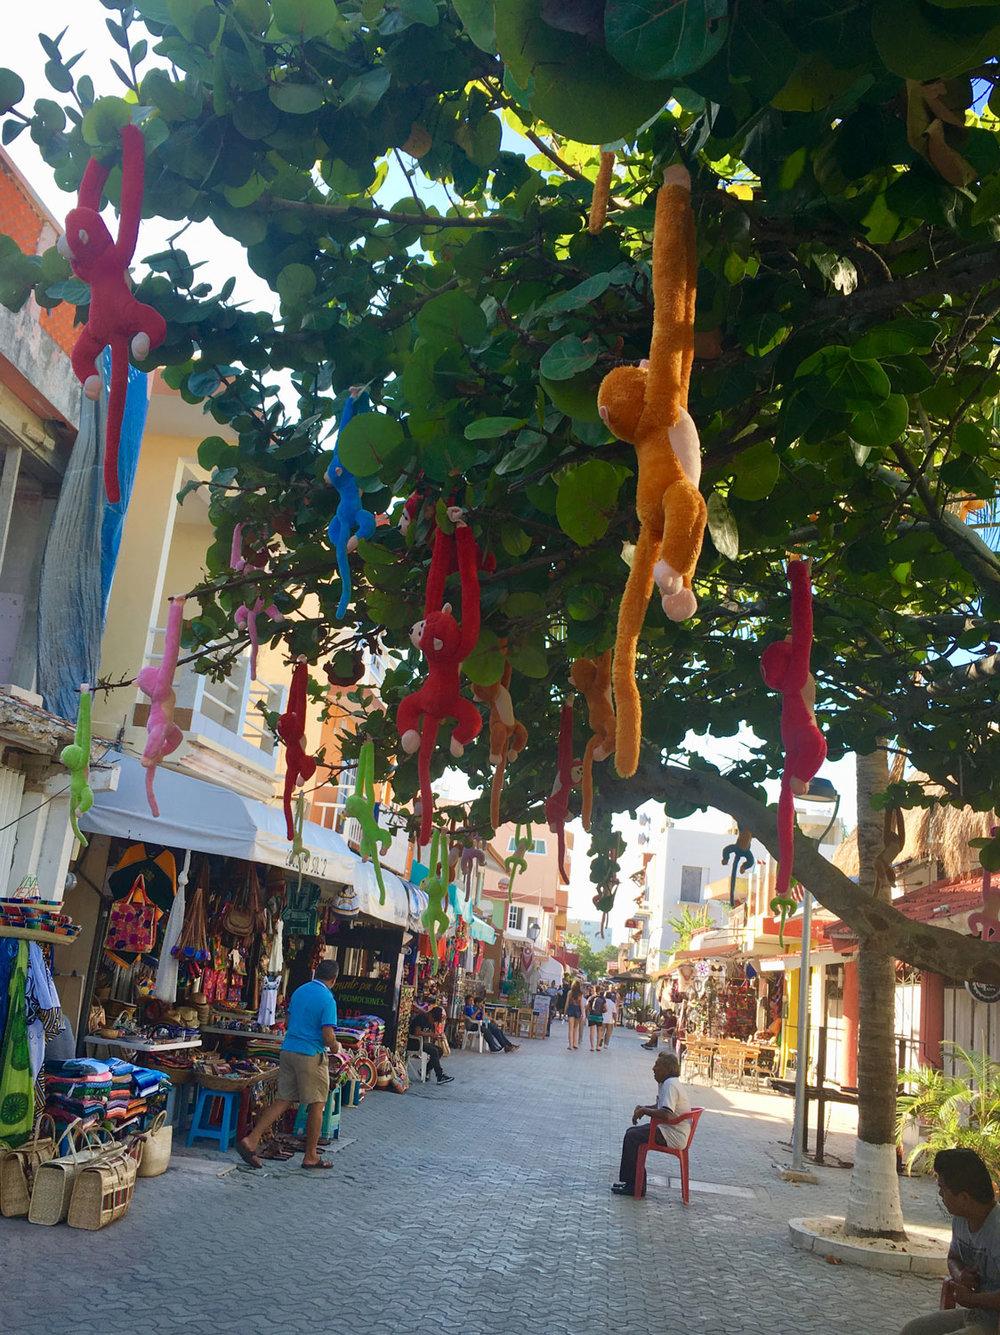 Hammocks_and_Ruins_Riviera_Maya_What_to_Do_Playa_Del_Carmen_Tulum_Islands_Isla_Mujeres_28.jpg